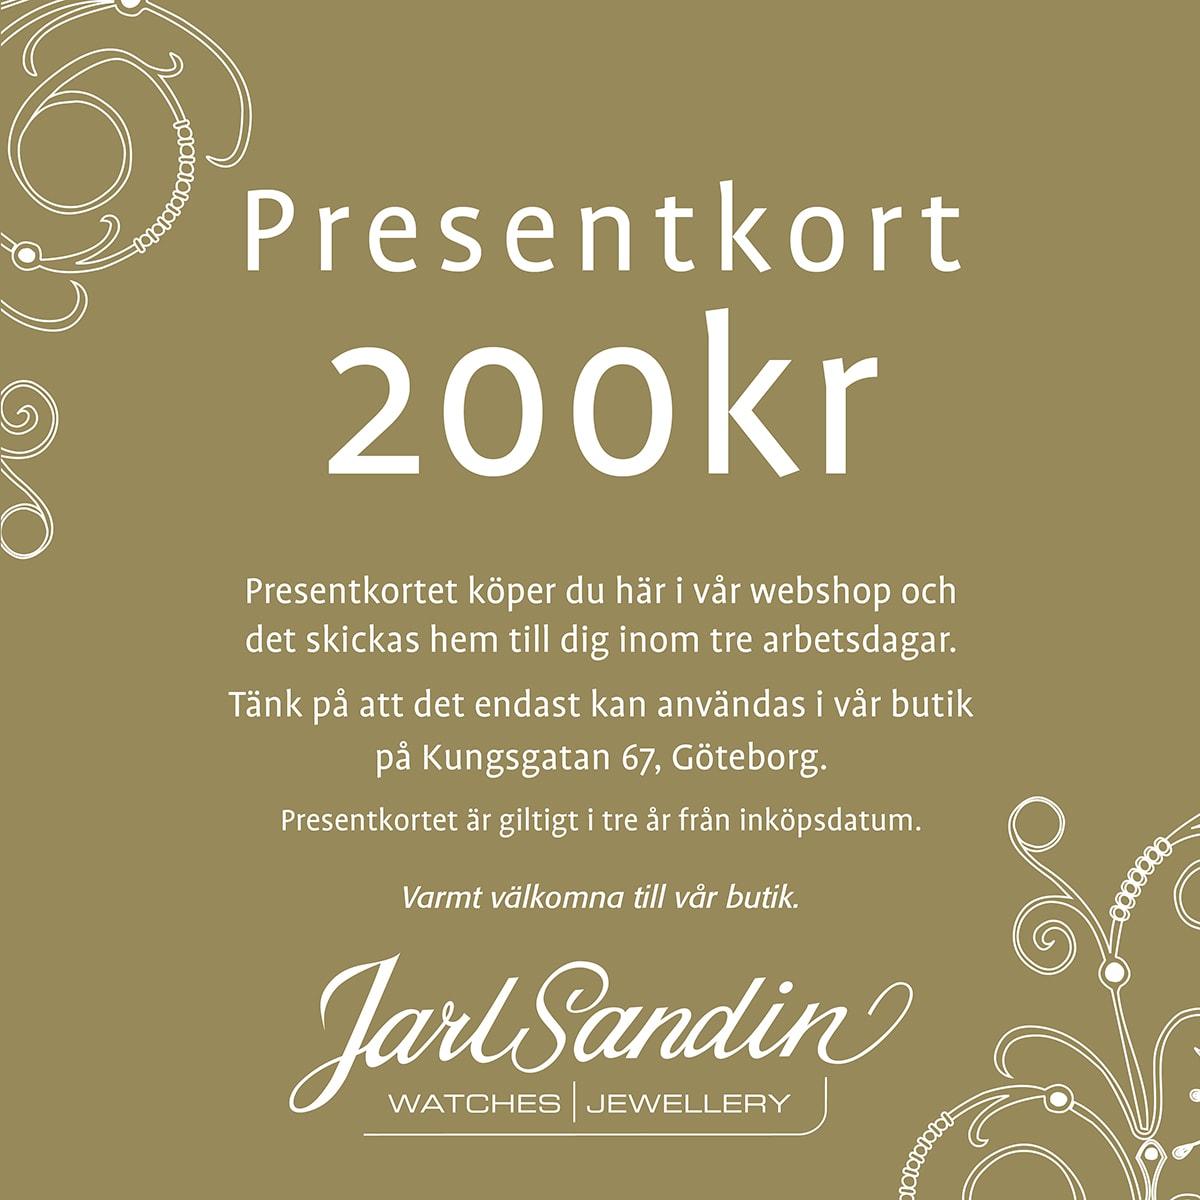 Presentkort_Jarl_Sandin_ 200kr